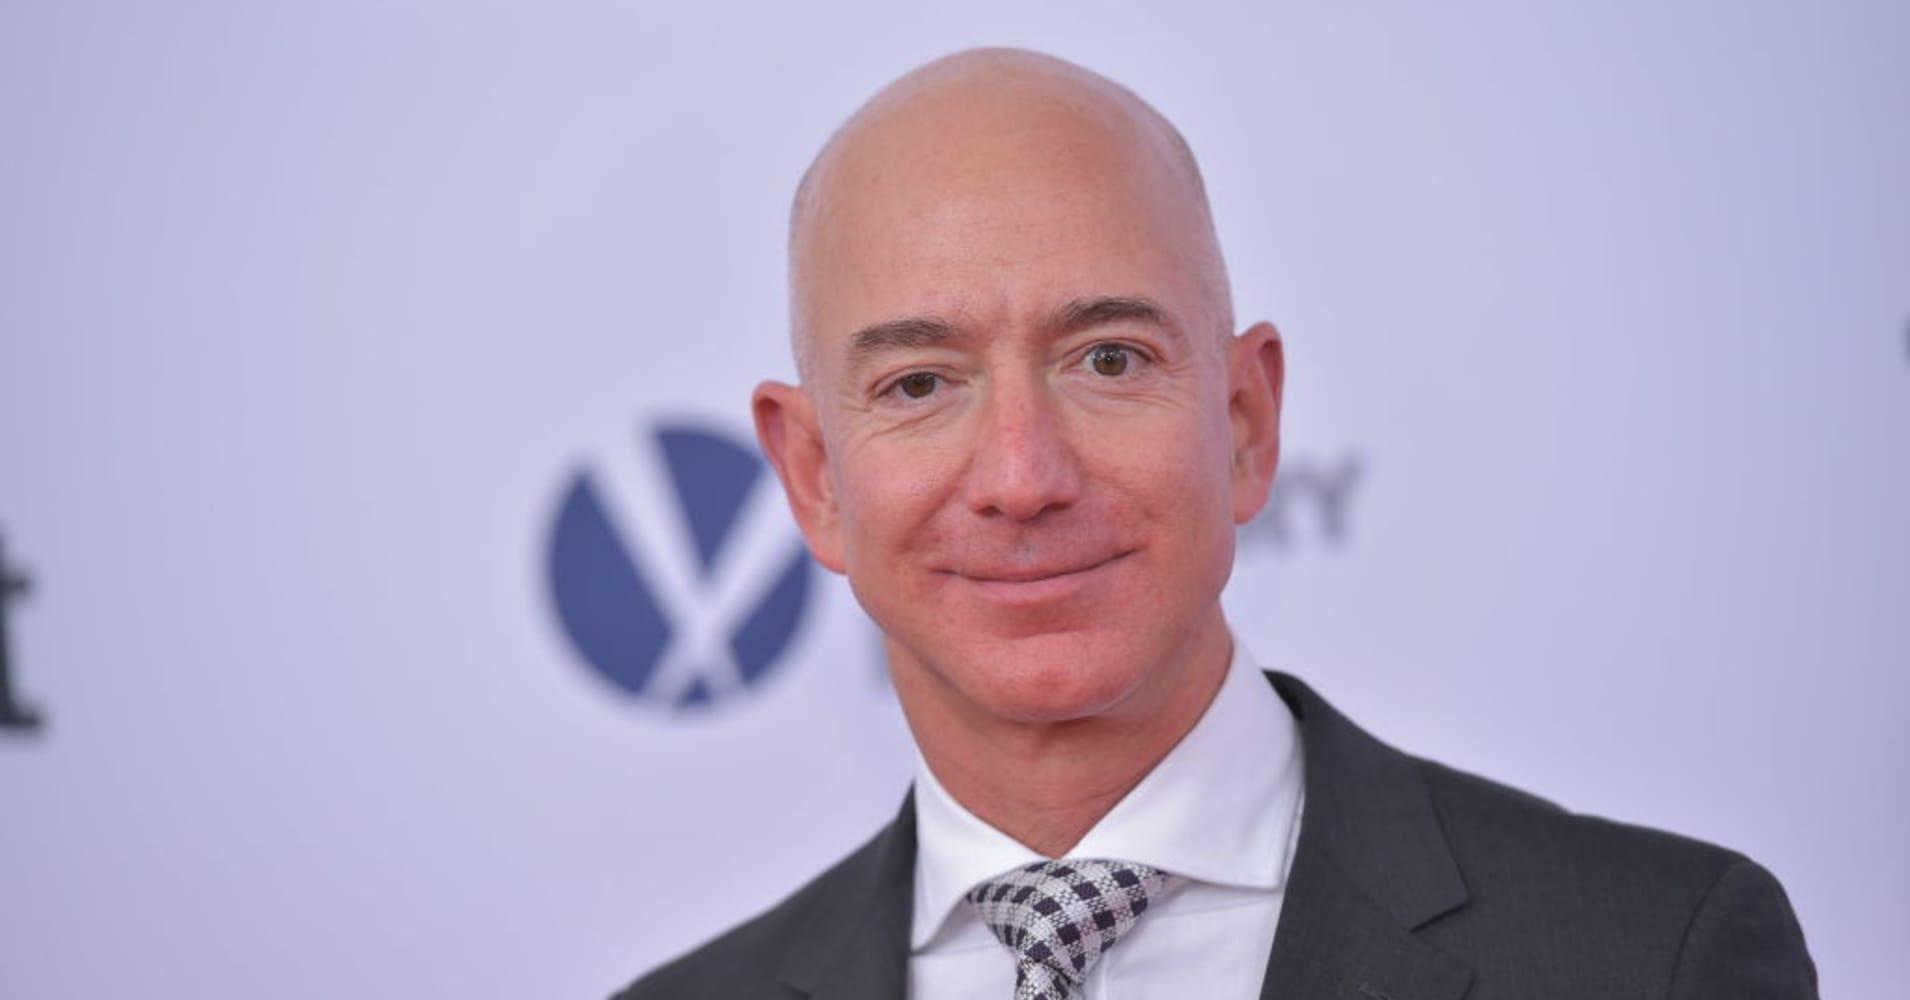 Jeff Bezos keeps this inspiring quote on his fridge